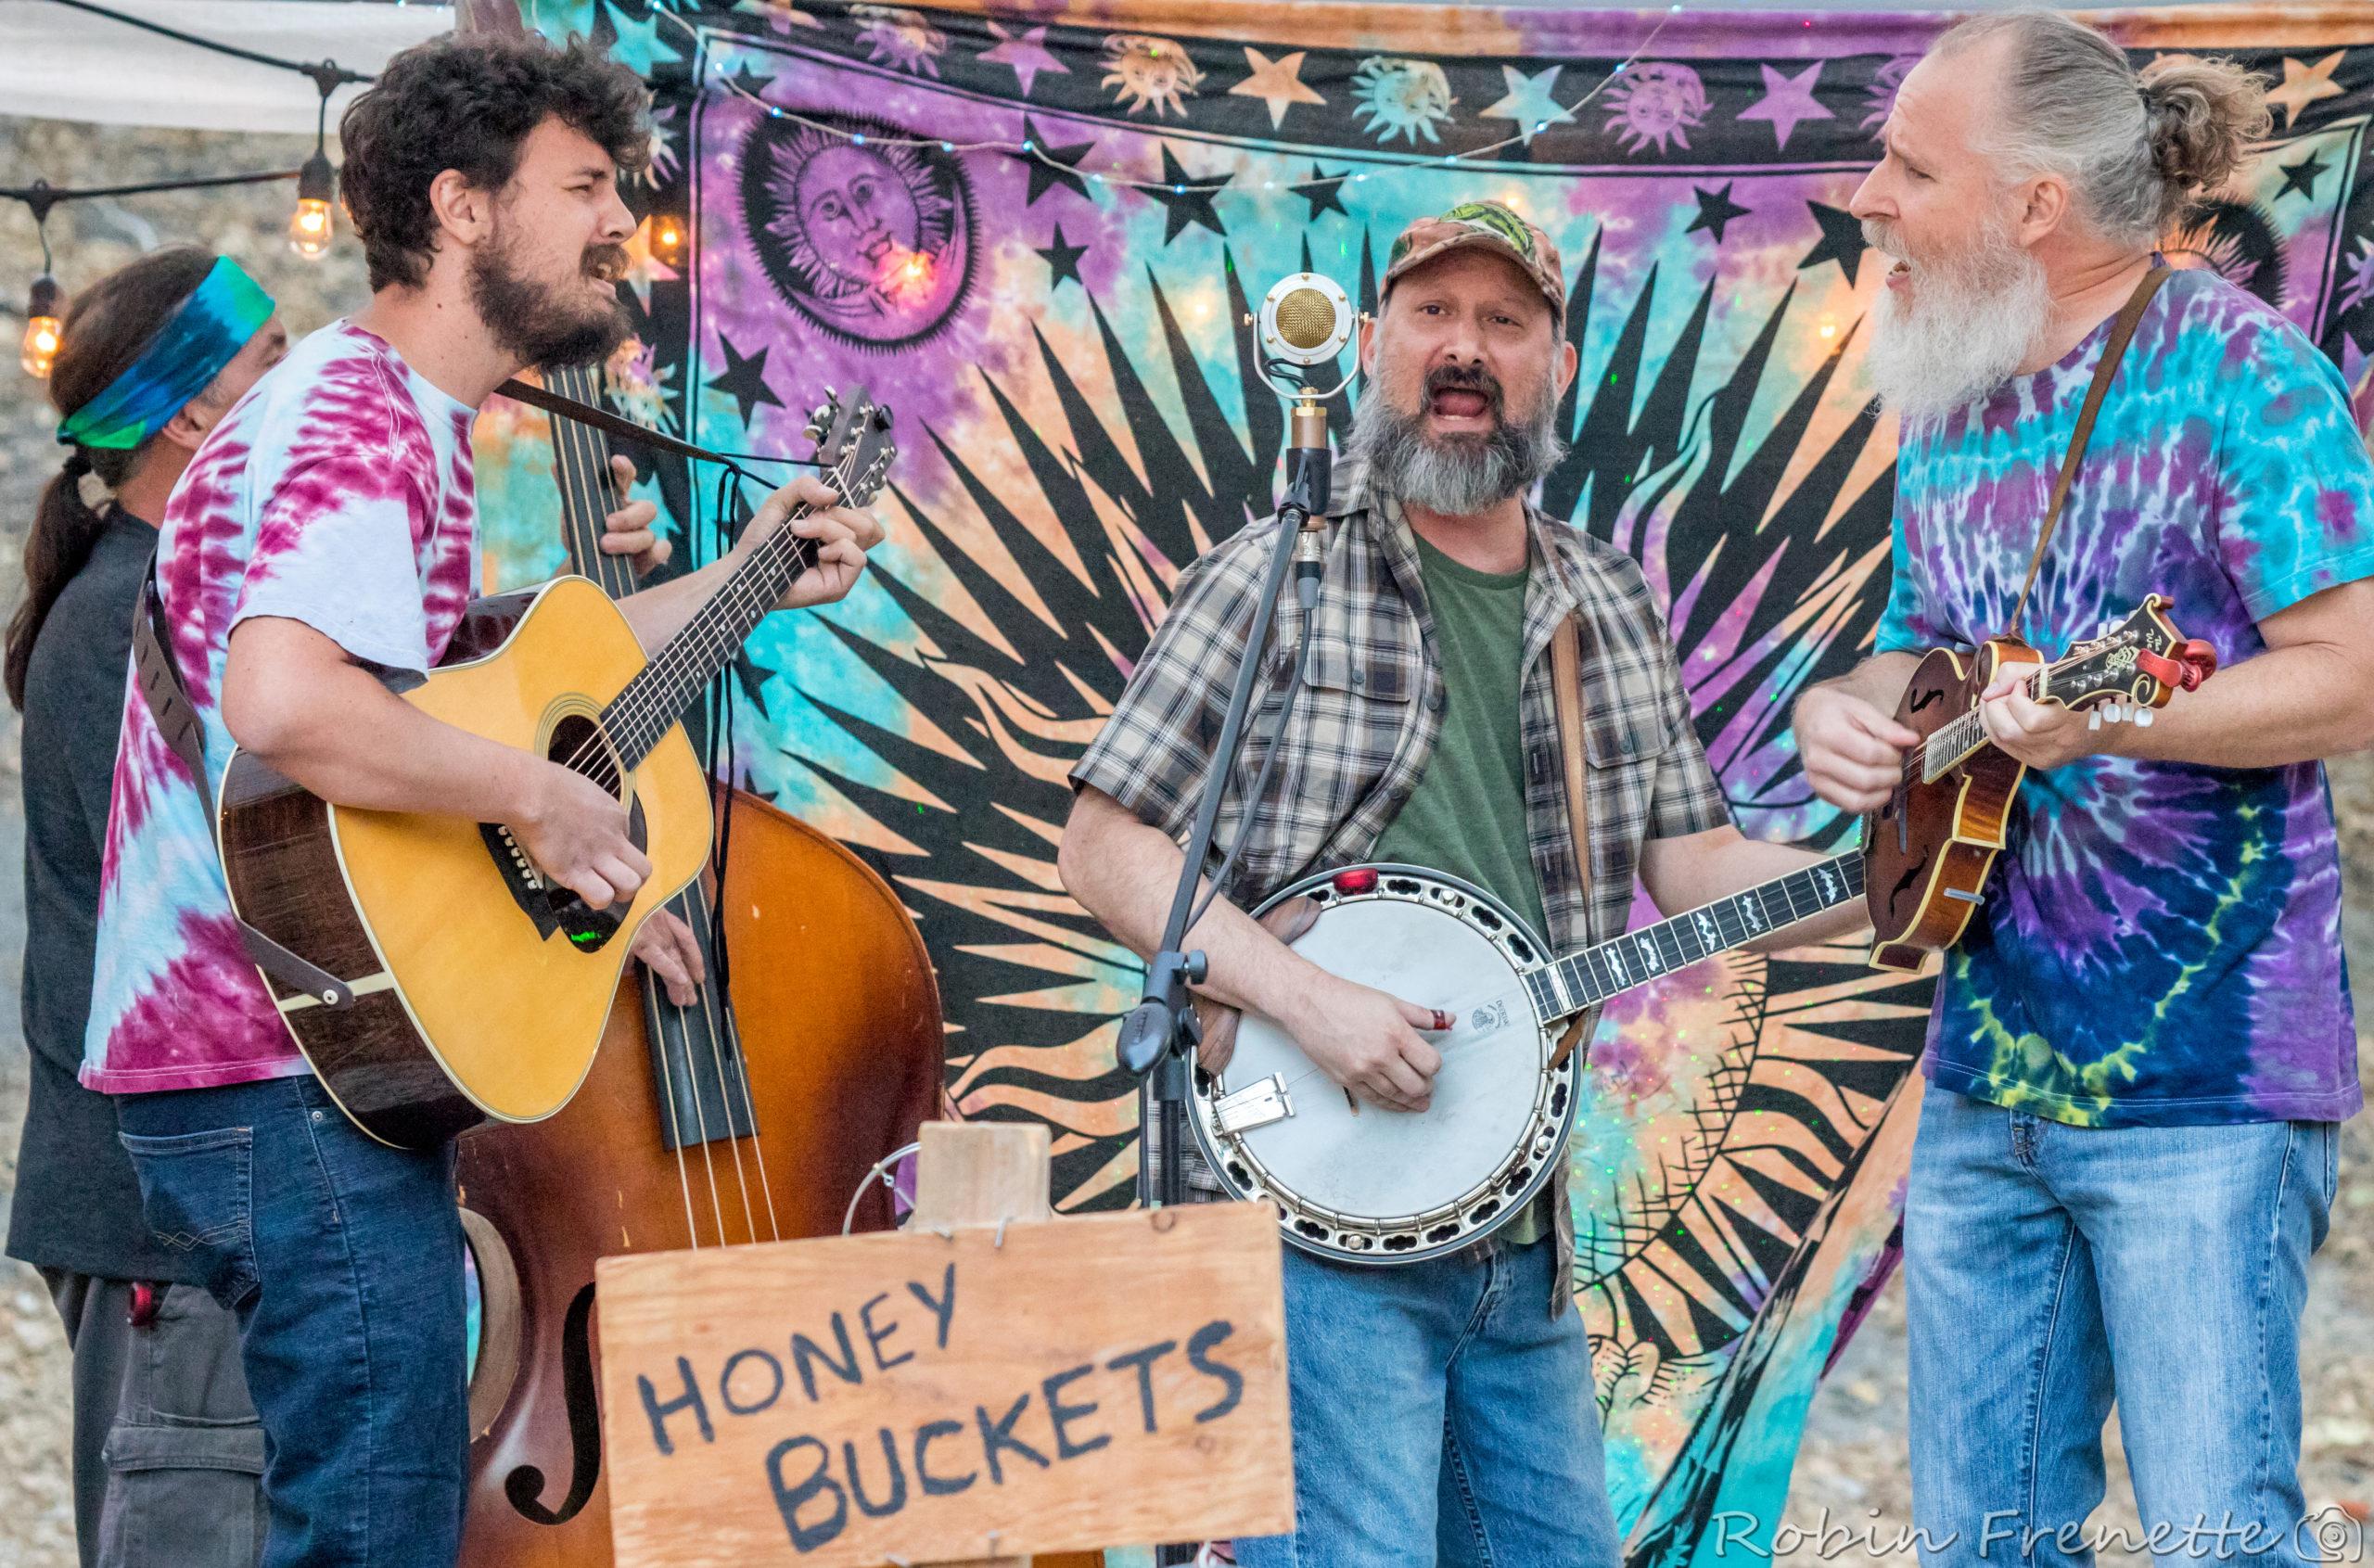 Big Pines Mountain Music Wrightwood 2021 - Honey Buckets Bluegrass Band